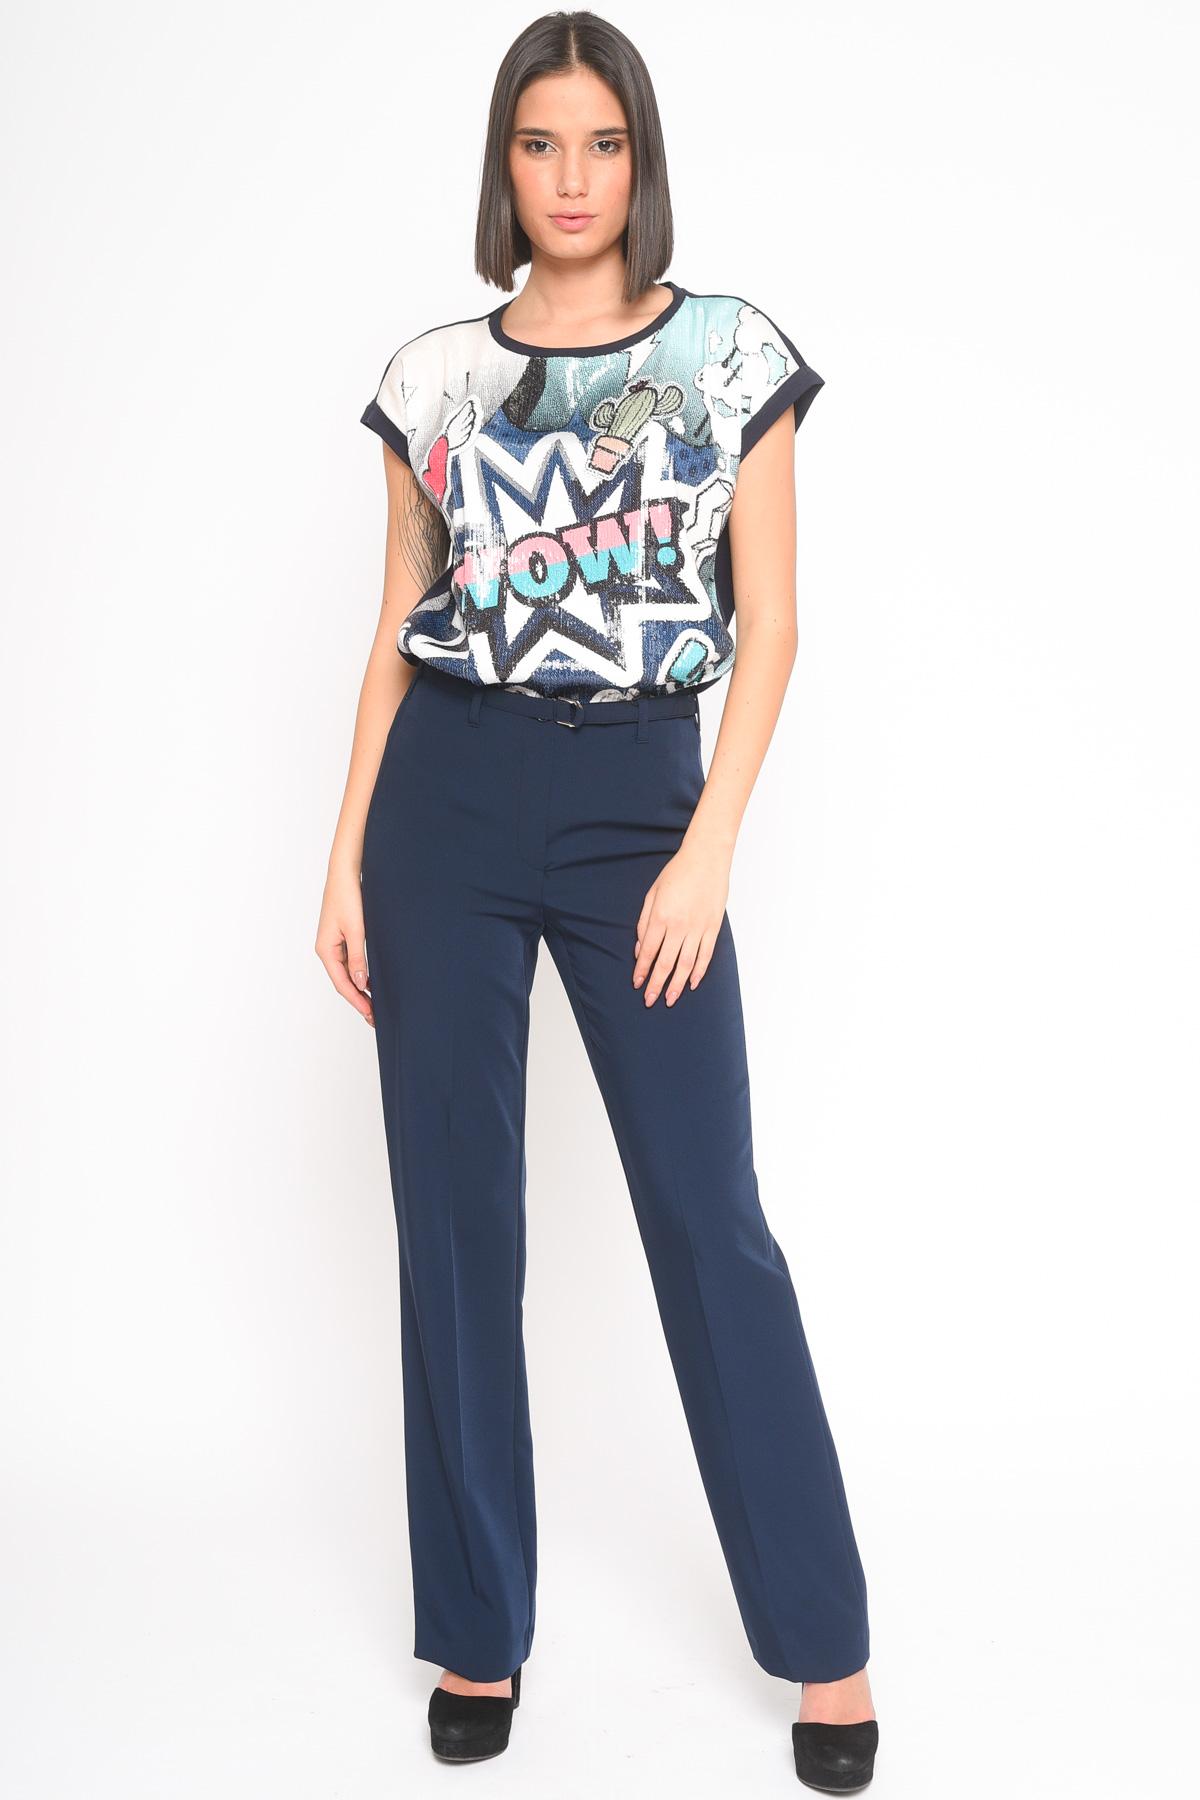 PANTALONI CON CINTURA for women - BLUE - Paquito Pronto Moda Shop Online